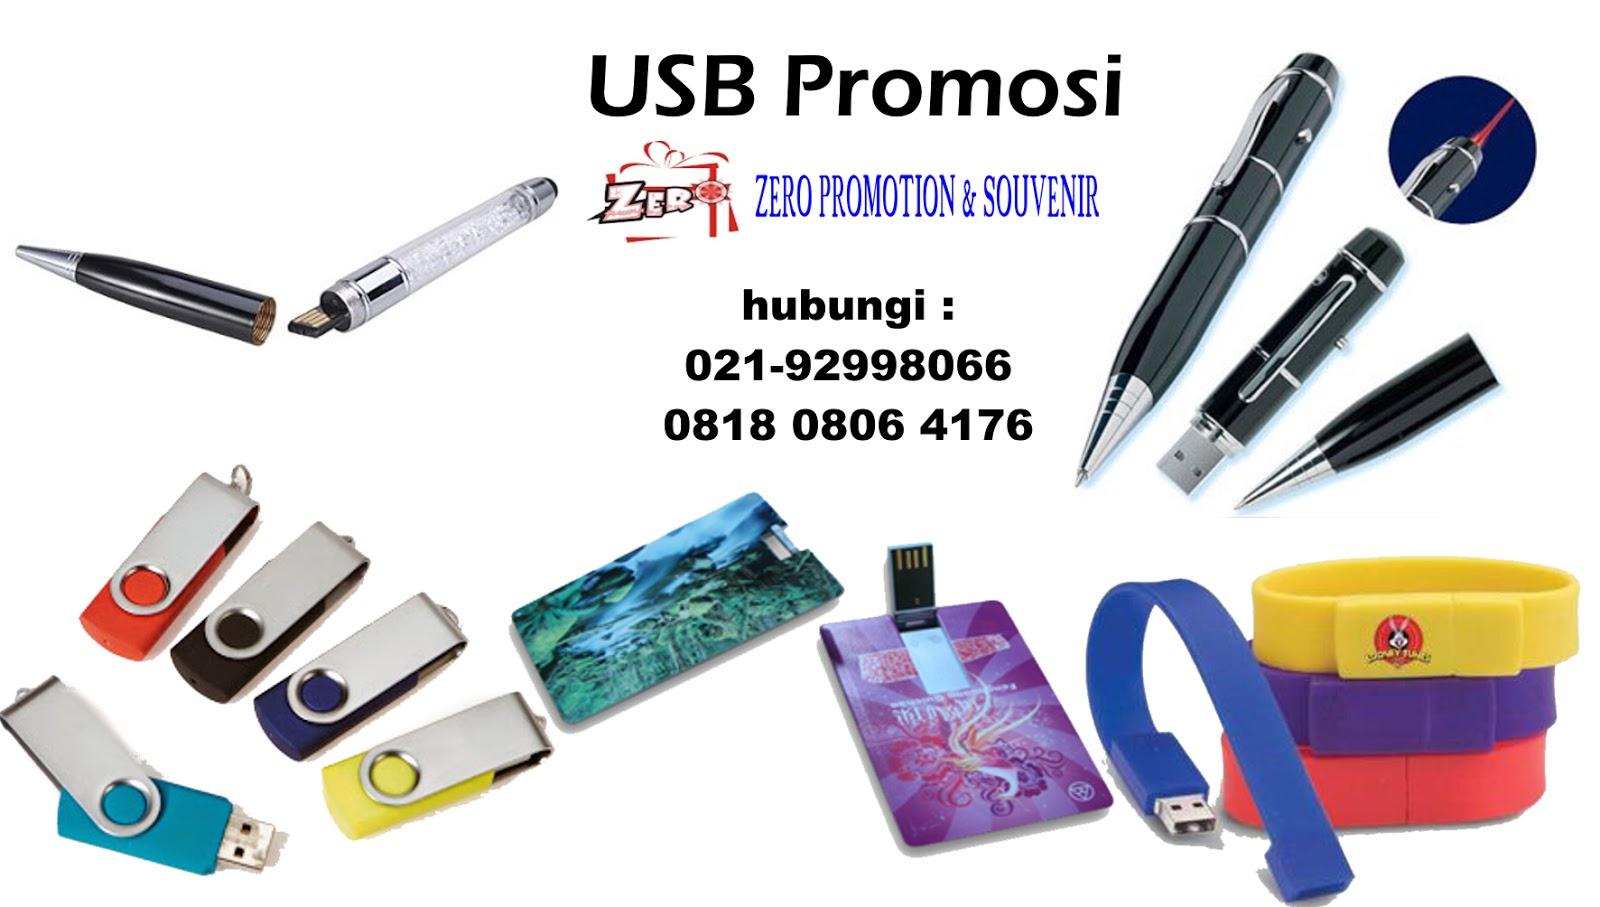 https://res.cloudinary.com/daydapk4h/image/upload/v1516353465/jual-flashdisk-kartu-promosi_newr7o.jpg